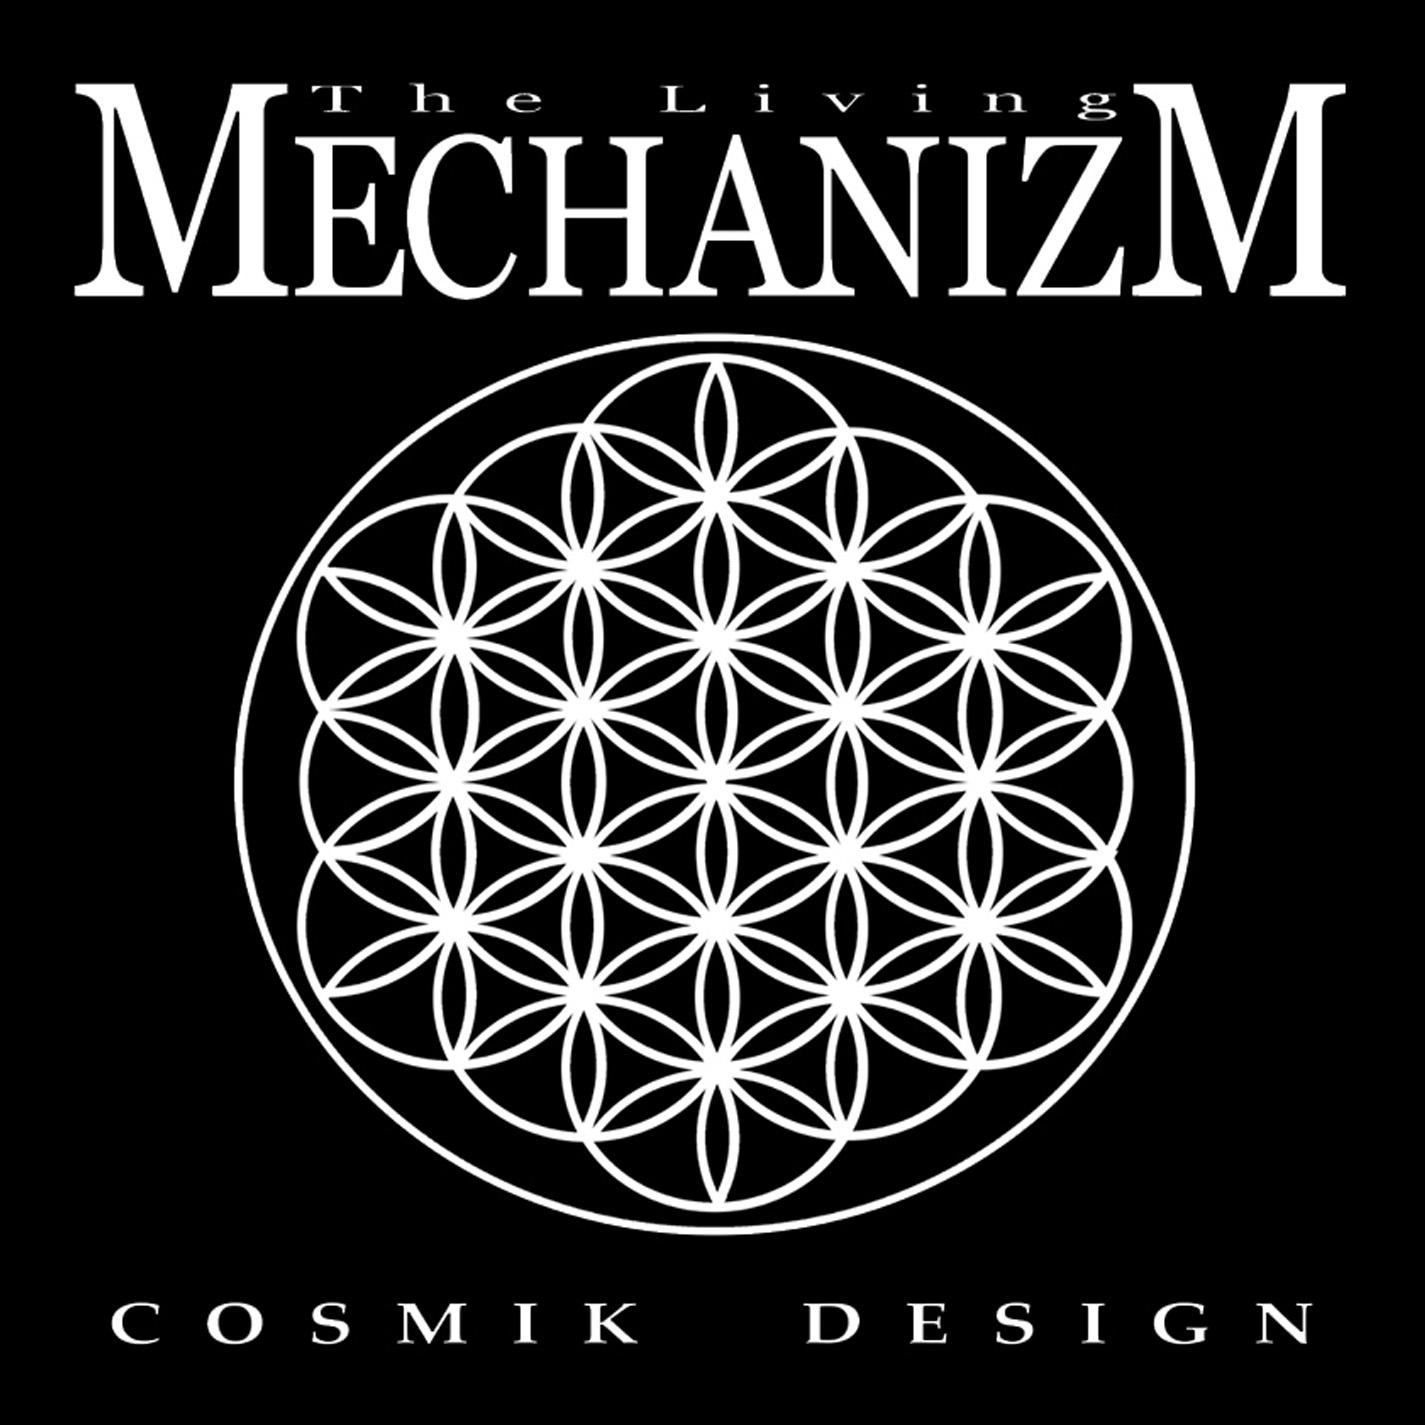 cosmikdesign.jpg